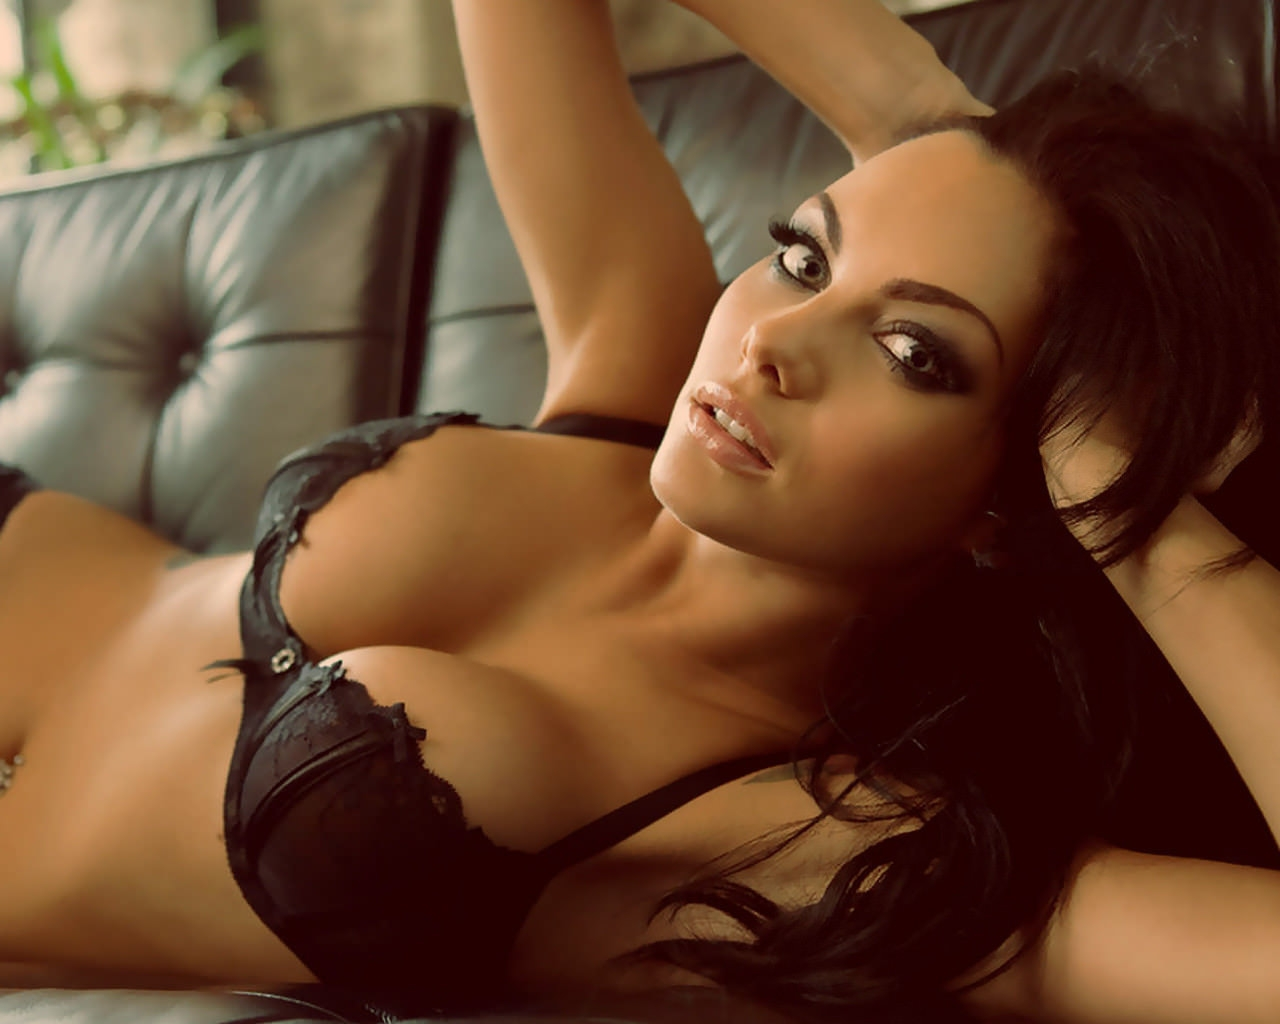 Melissa ordway nude porn pics leaked, xxx sex photos